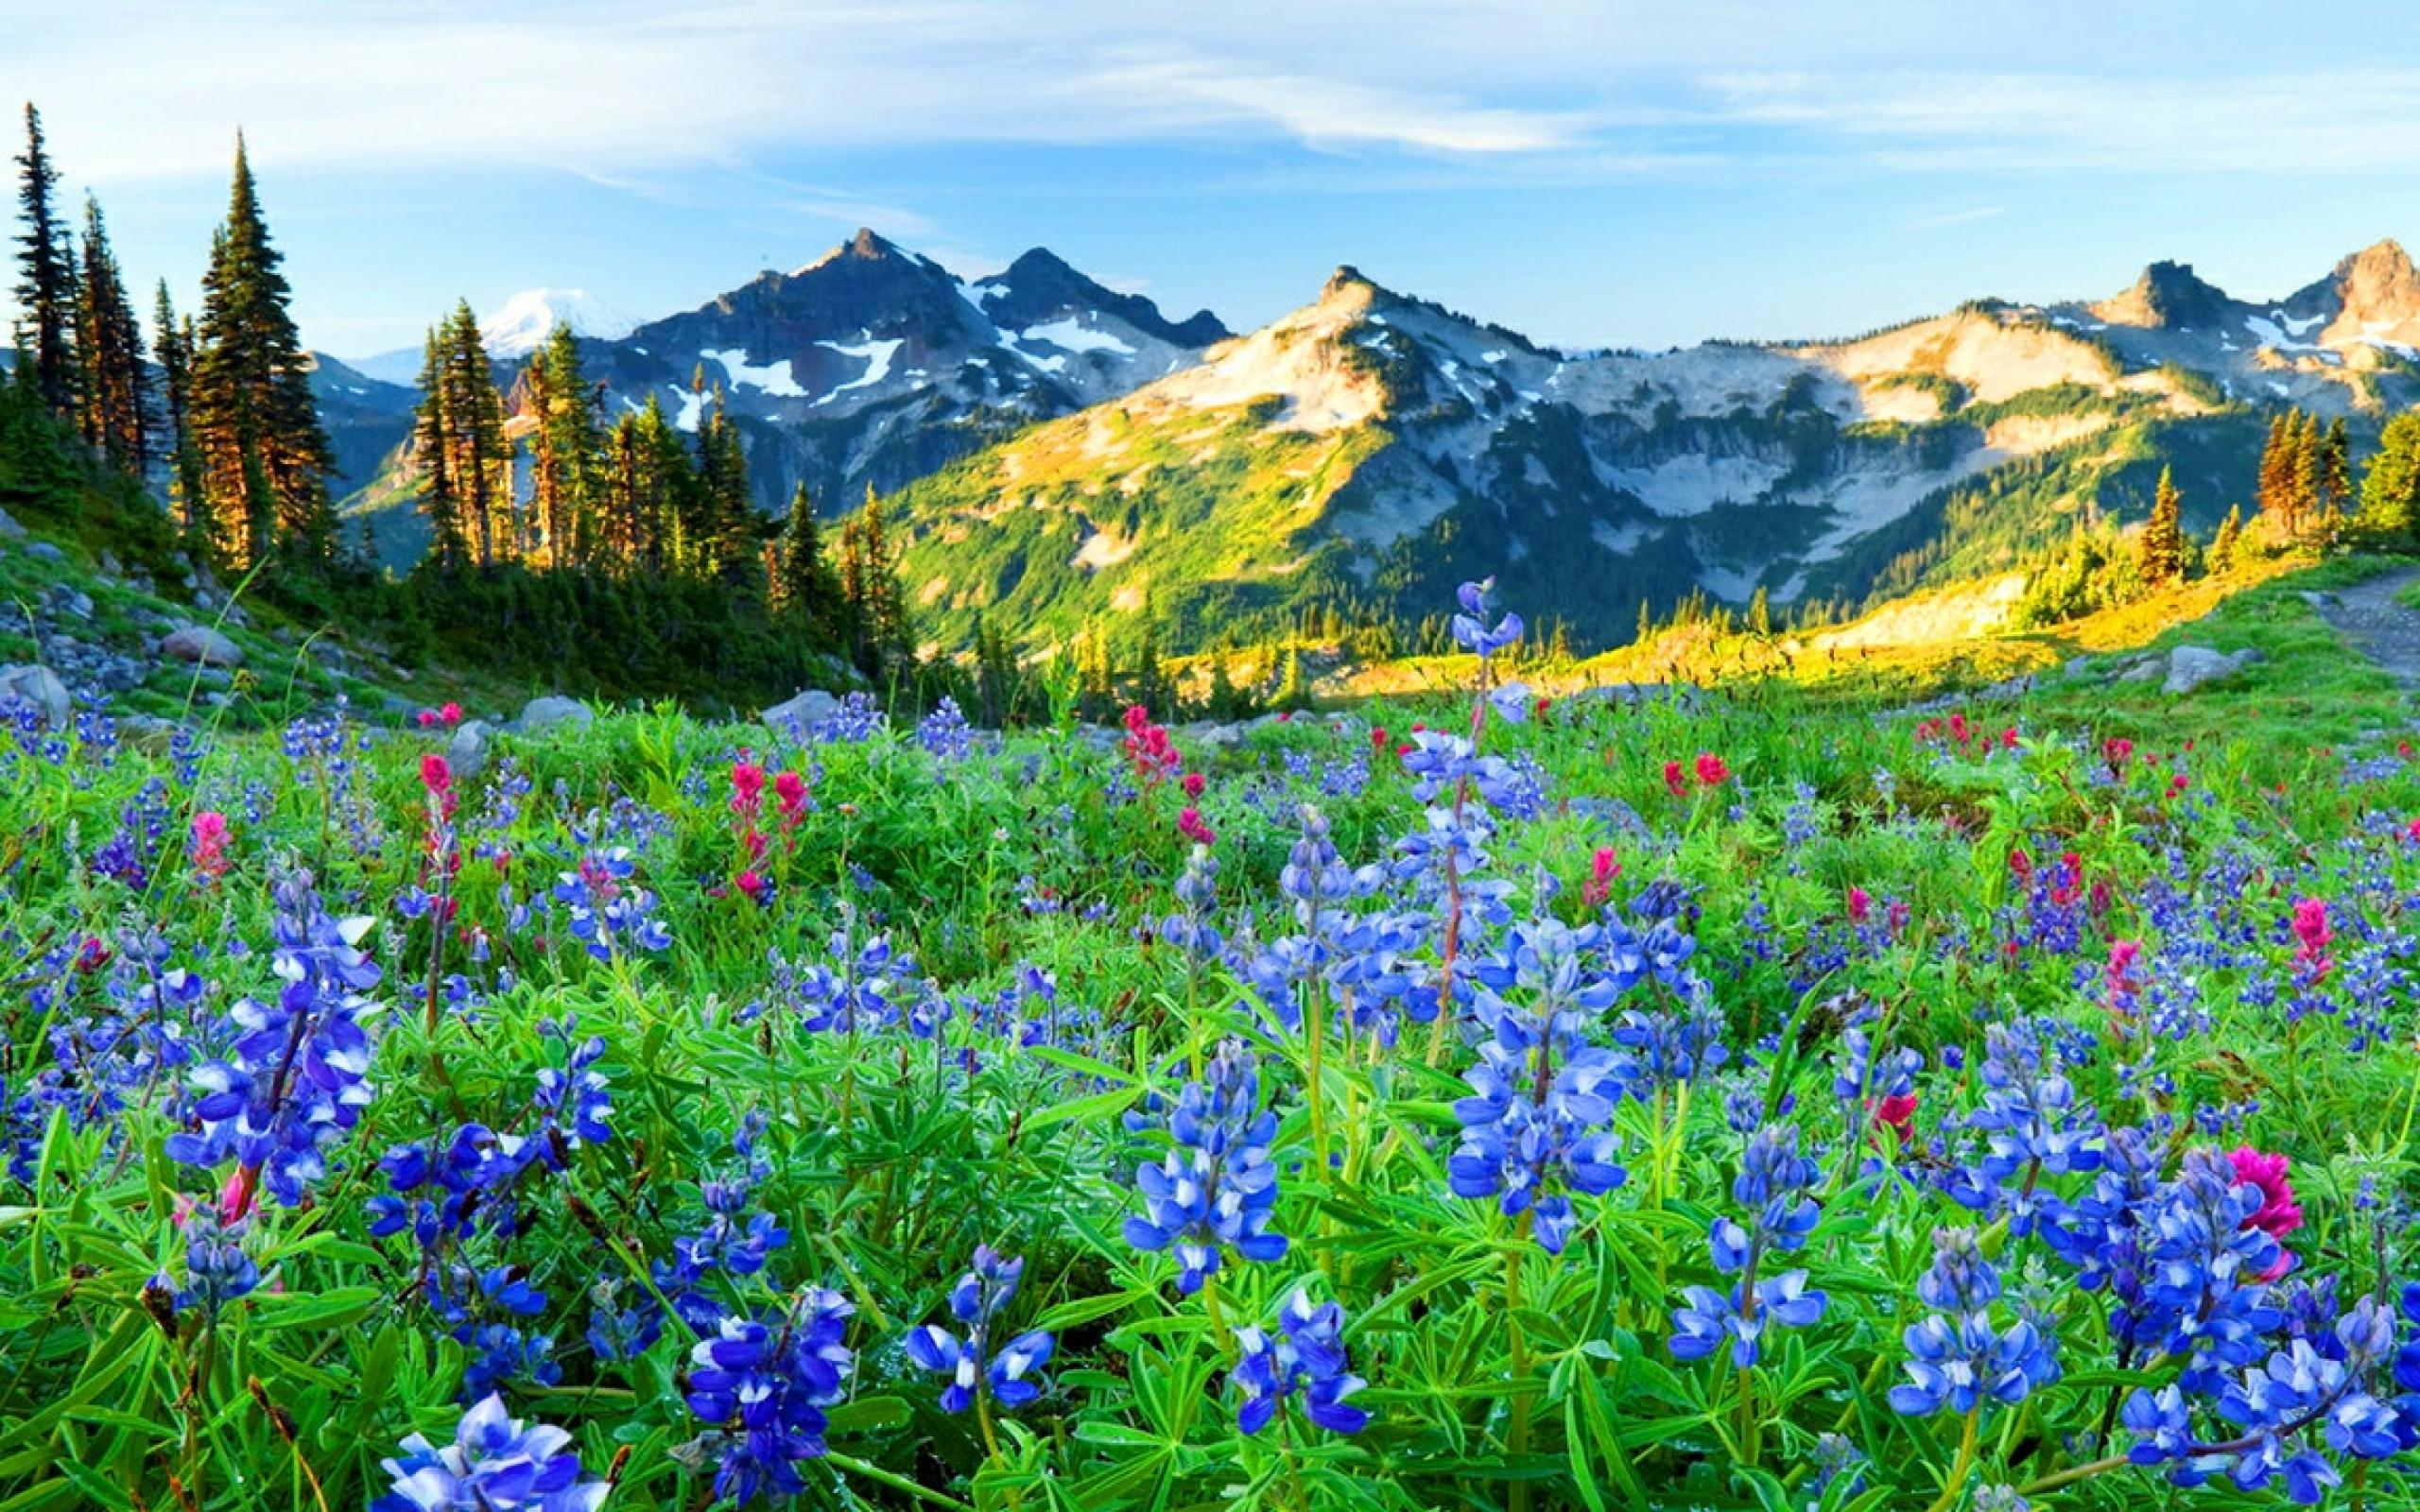 Mountain wildflowers Wallpaper